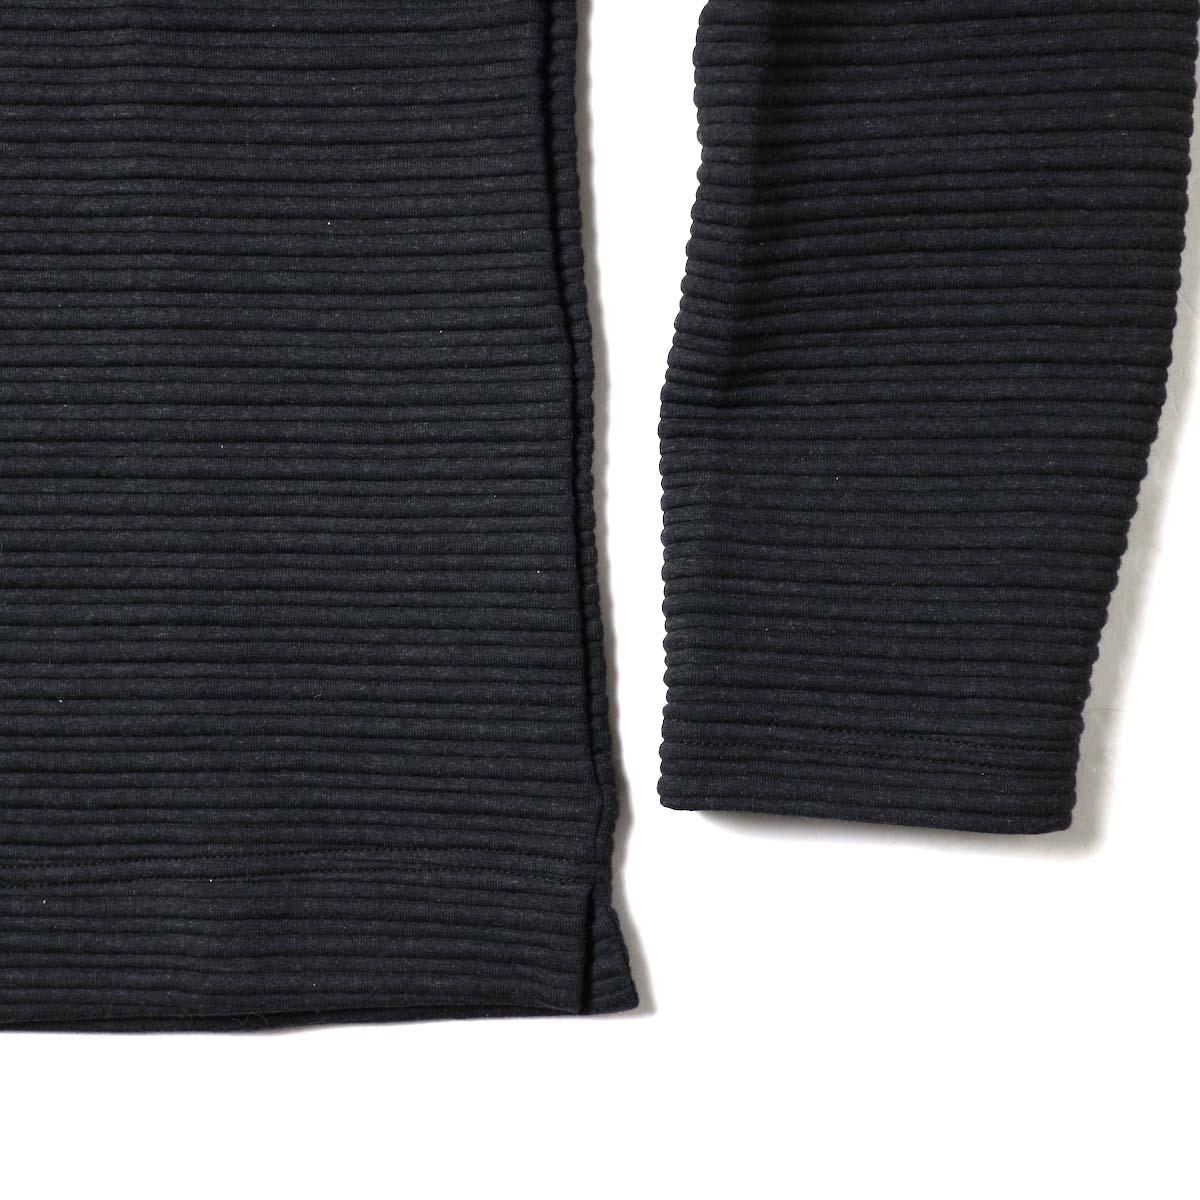 Jackman / Quilt Highneck (Black)袖、裾